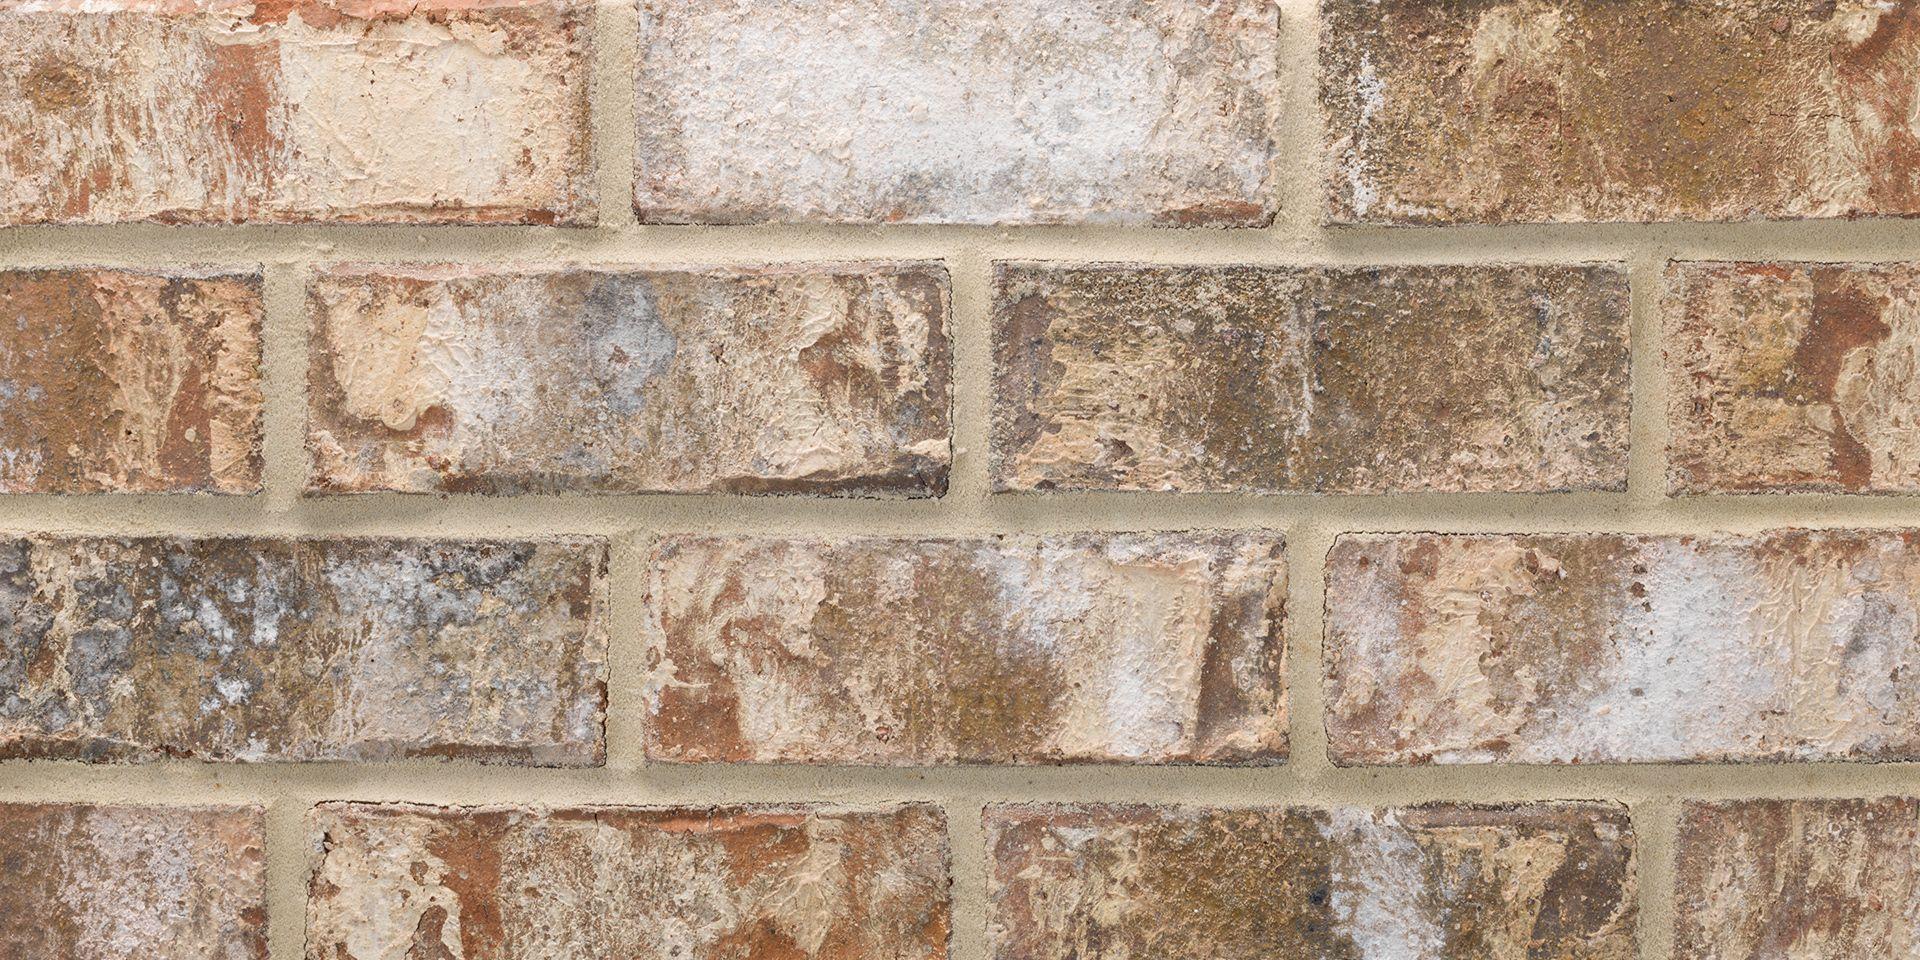 Acme Brick Tile And Stone Brickcom Aden Blend Queen Size